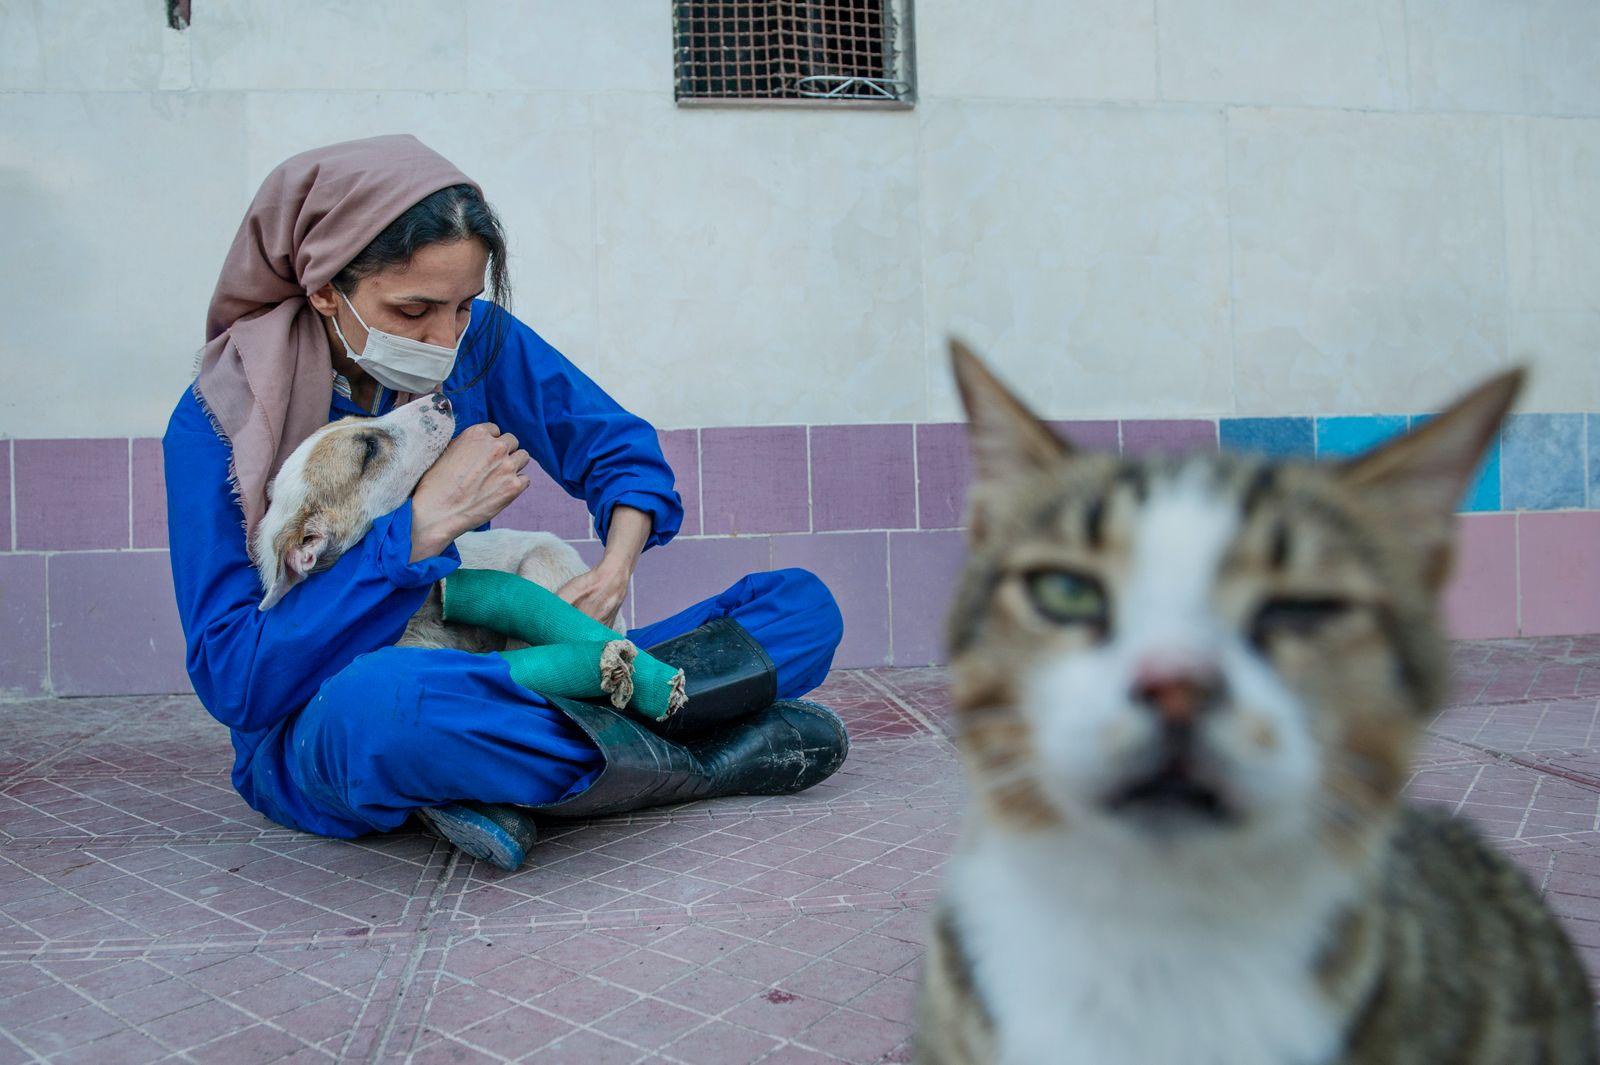 Azadeh, The Animal Shelter Owner